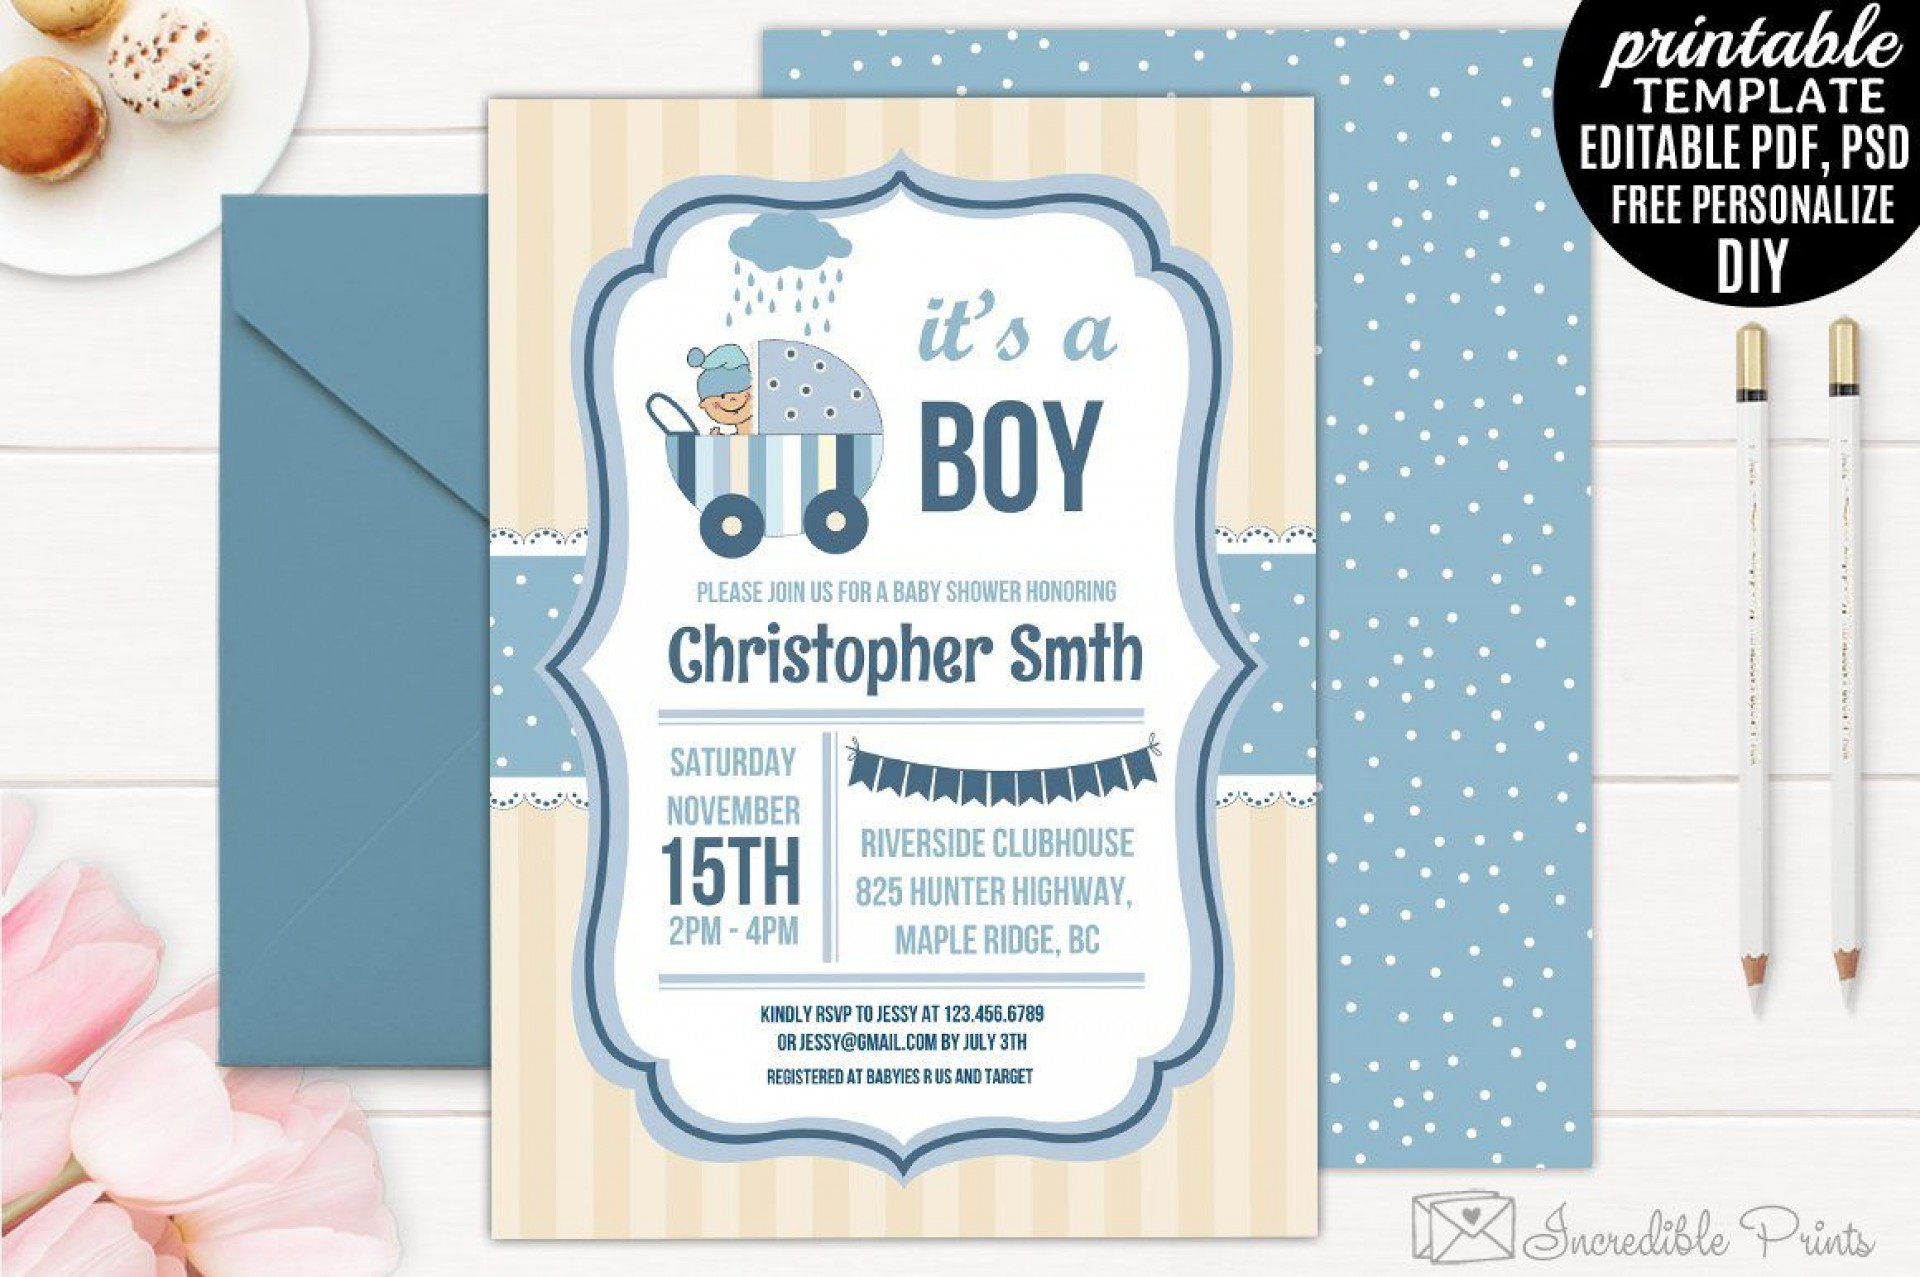 006 Awful Free Baby Shower Invitation Template Editable Example  Digital Microsoft Word1920